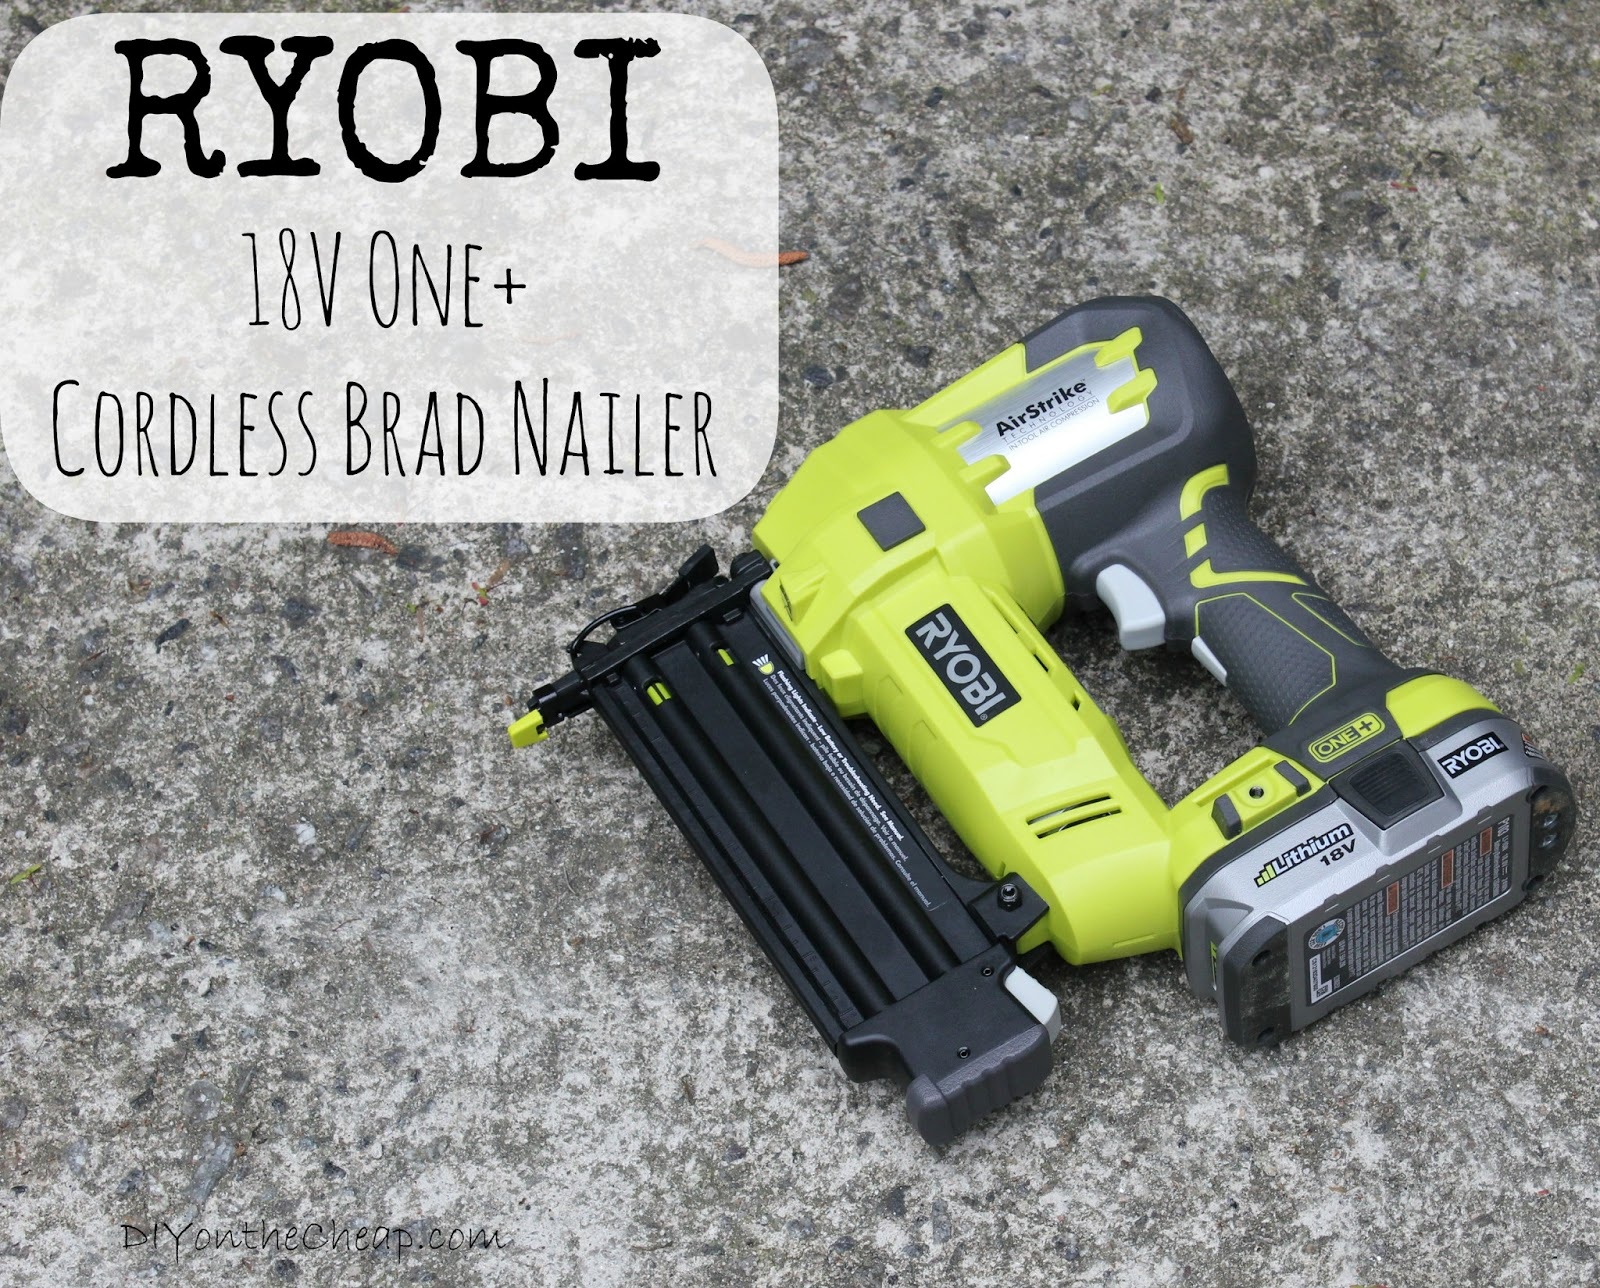 Ryobi 18v One Cordless Brad Nailer Review Erin Spain